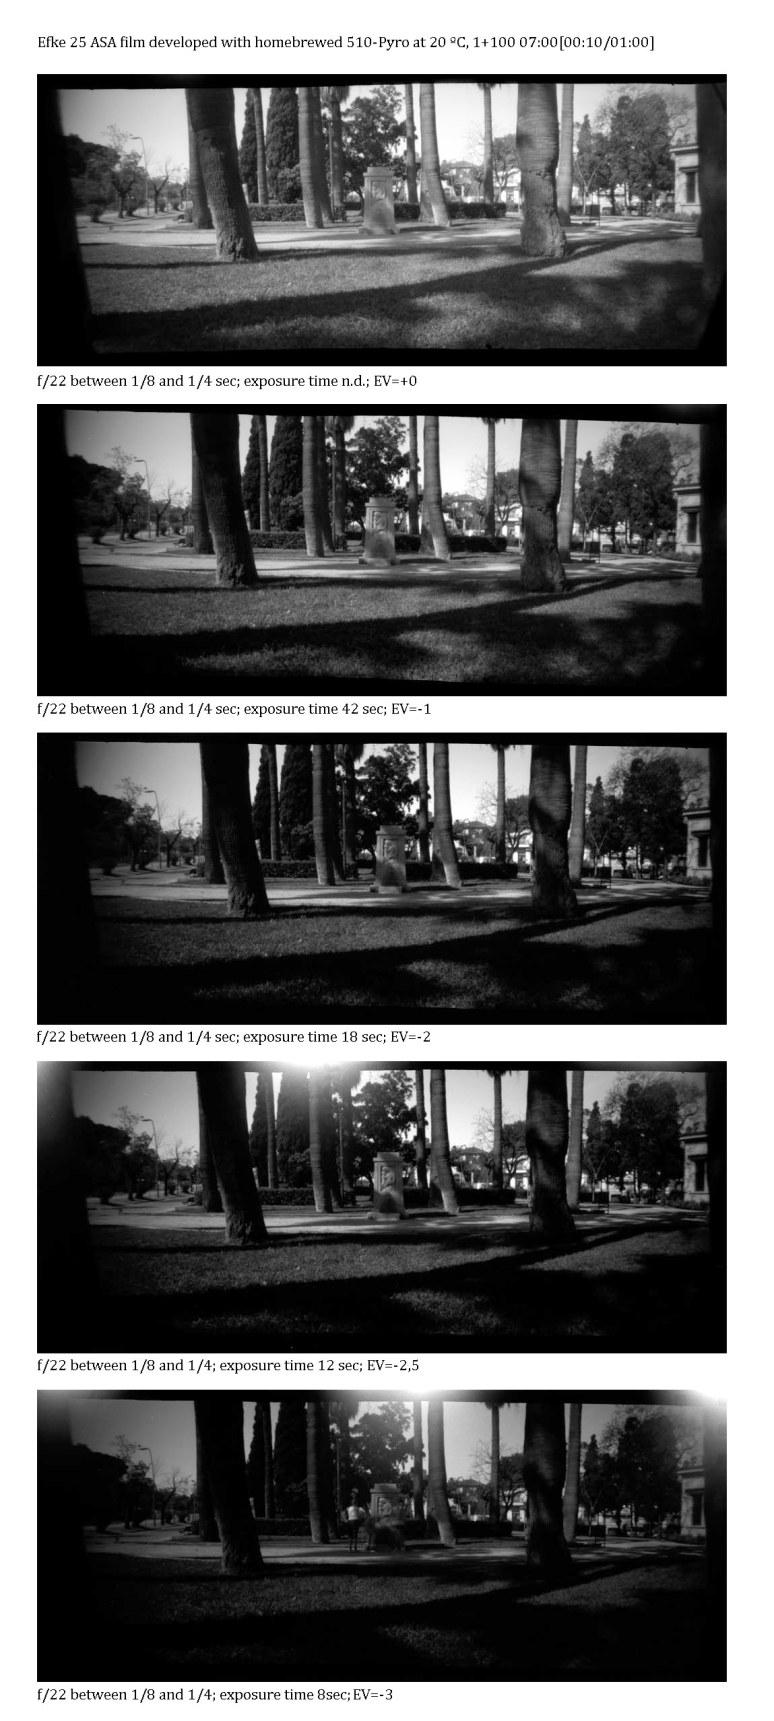 #1765 test roll #1 with an auto exposimeter 6x12 pinhole camera